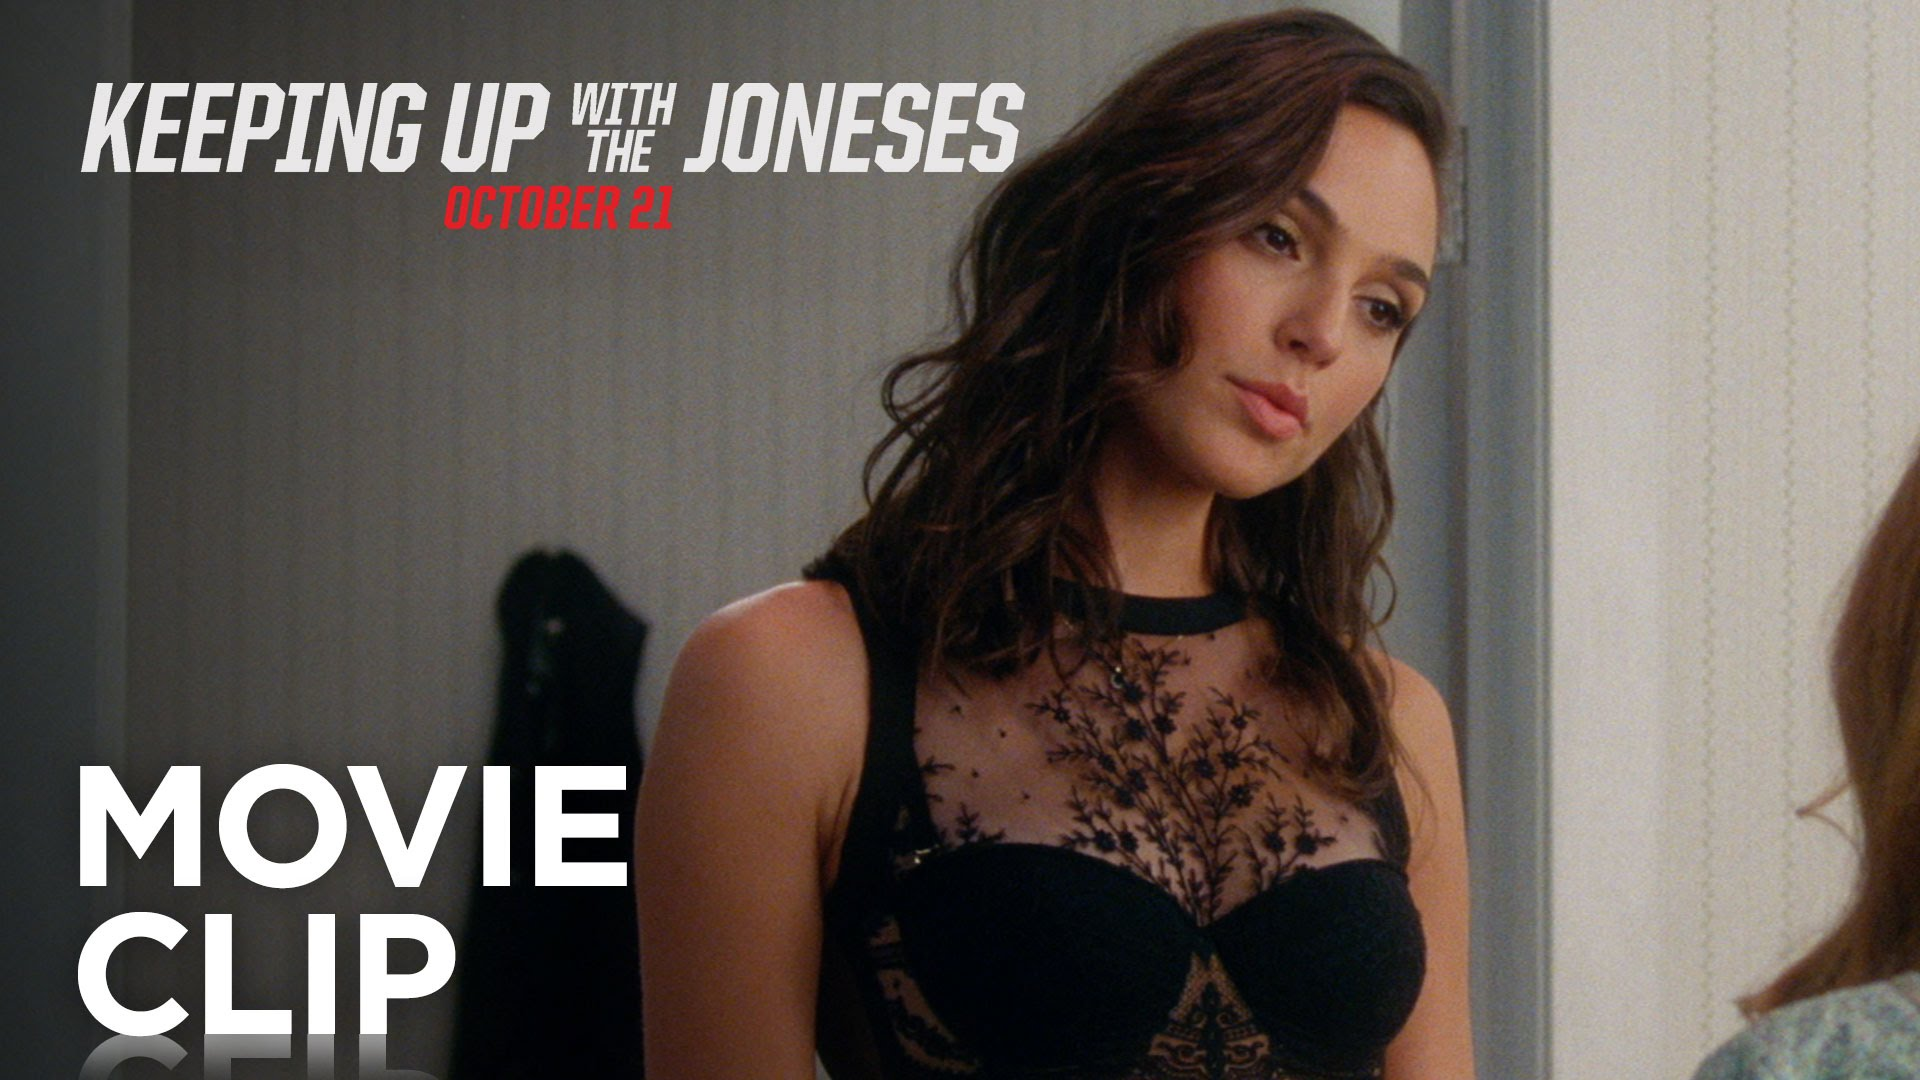 『Keeping Up With The Joneses』ガル・ガドットの美しい下着姿を披露した劇中映像を公開